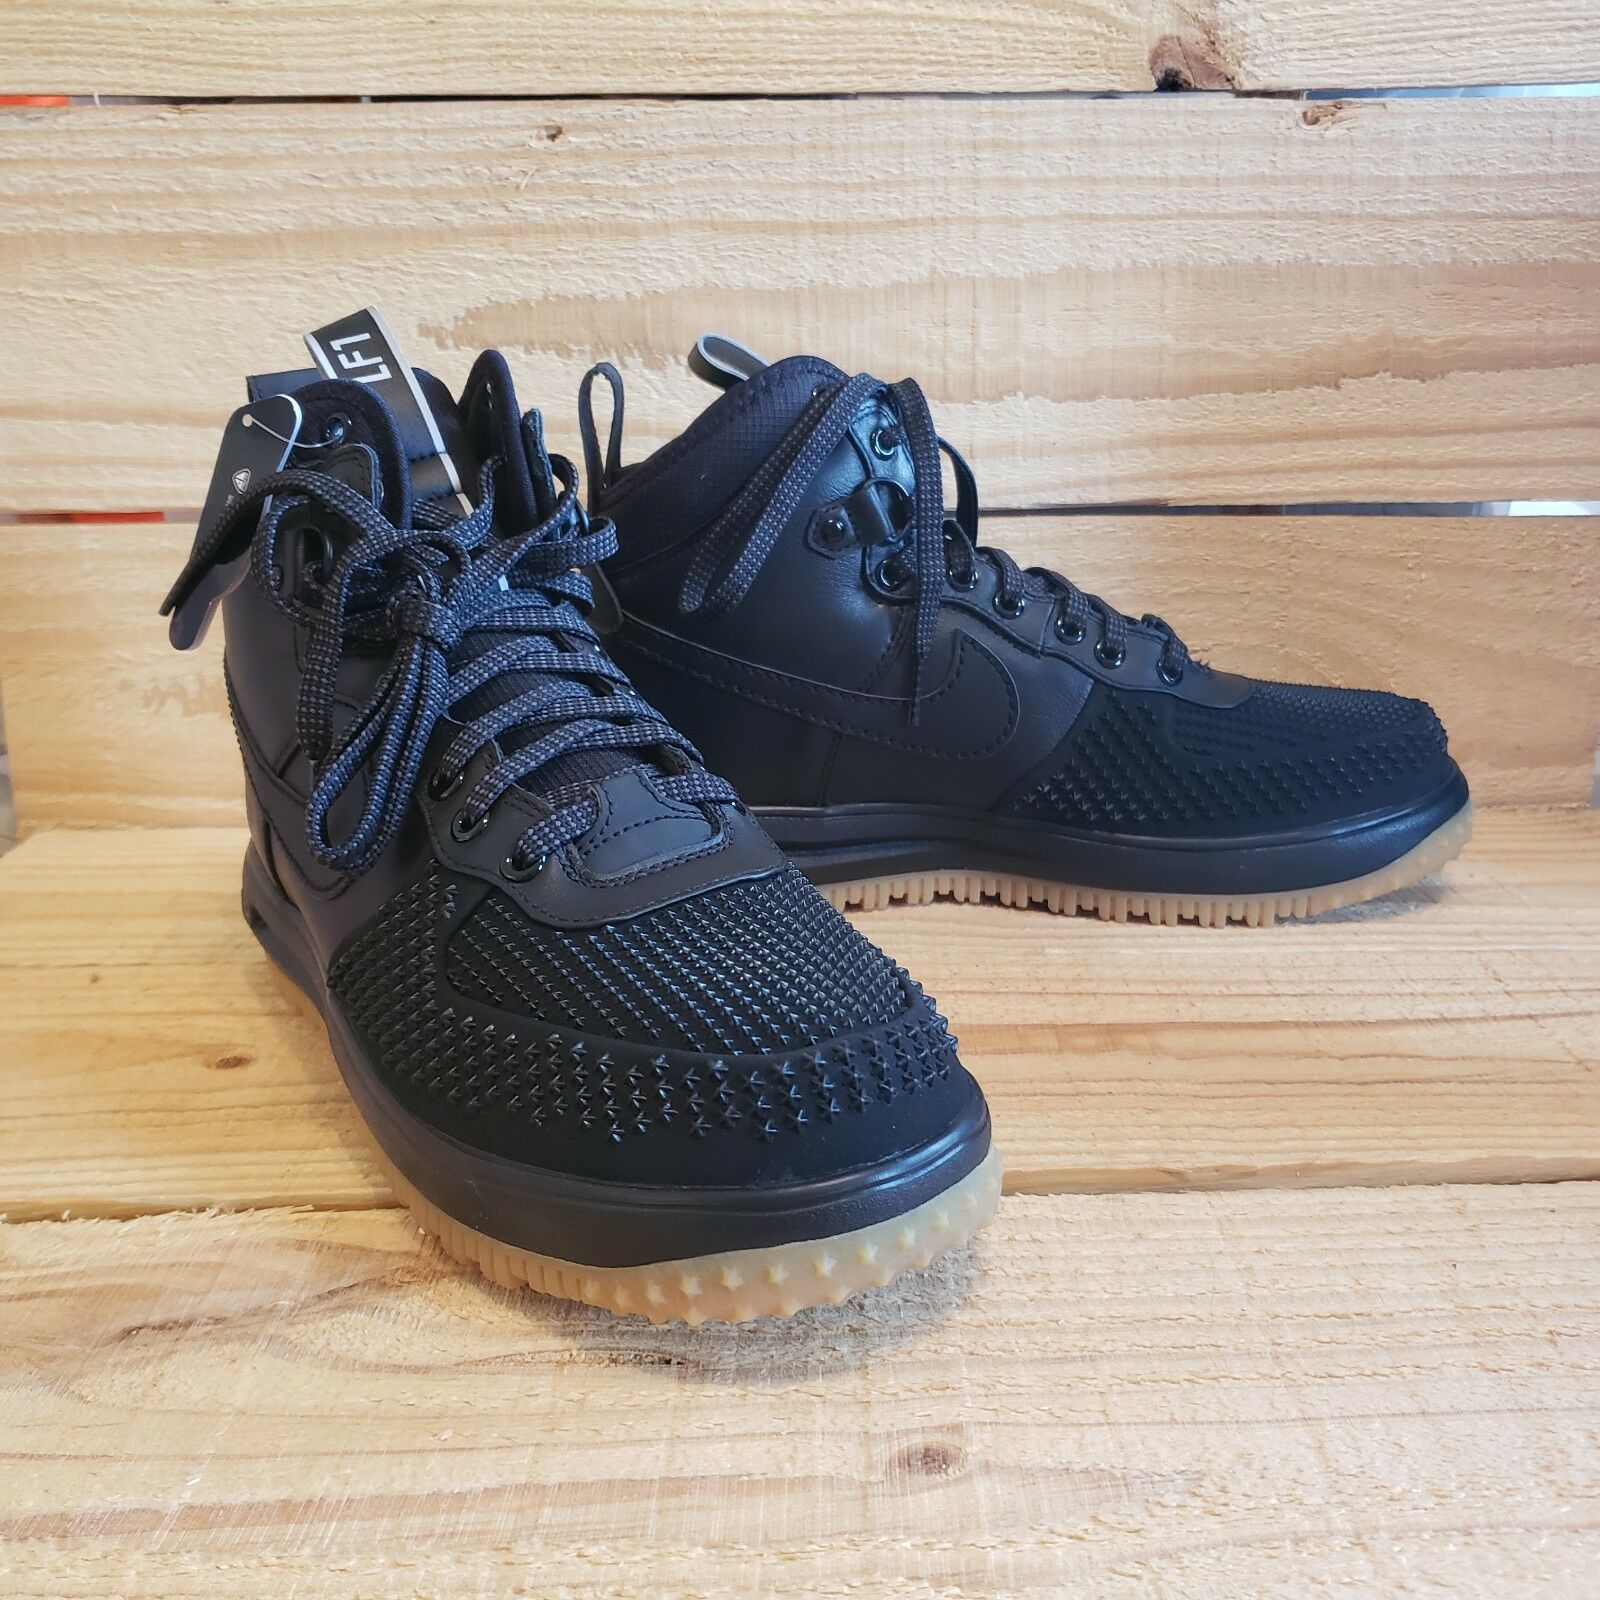 2083adaa06 Nike Lunar Air Force 1 Duckboot AF1 Gum 805899 003 Water Boot Size Black  Silver